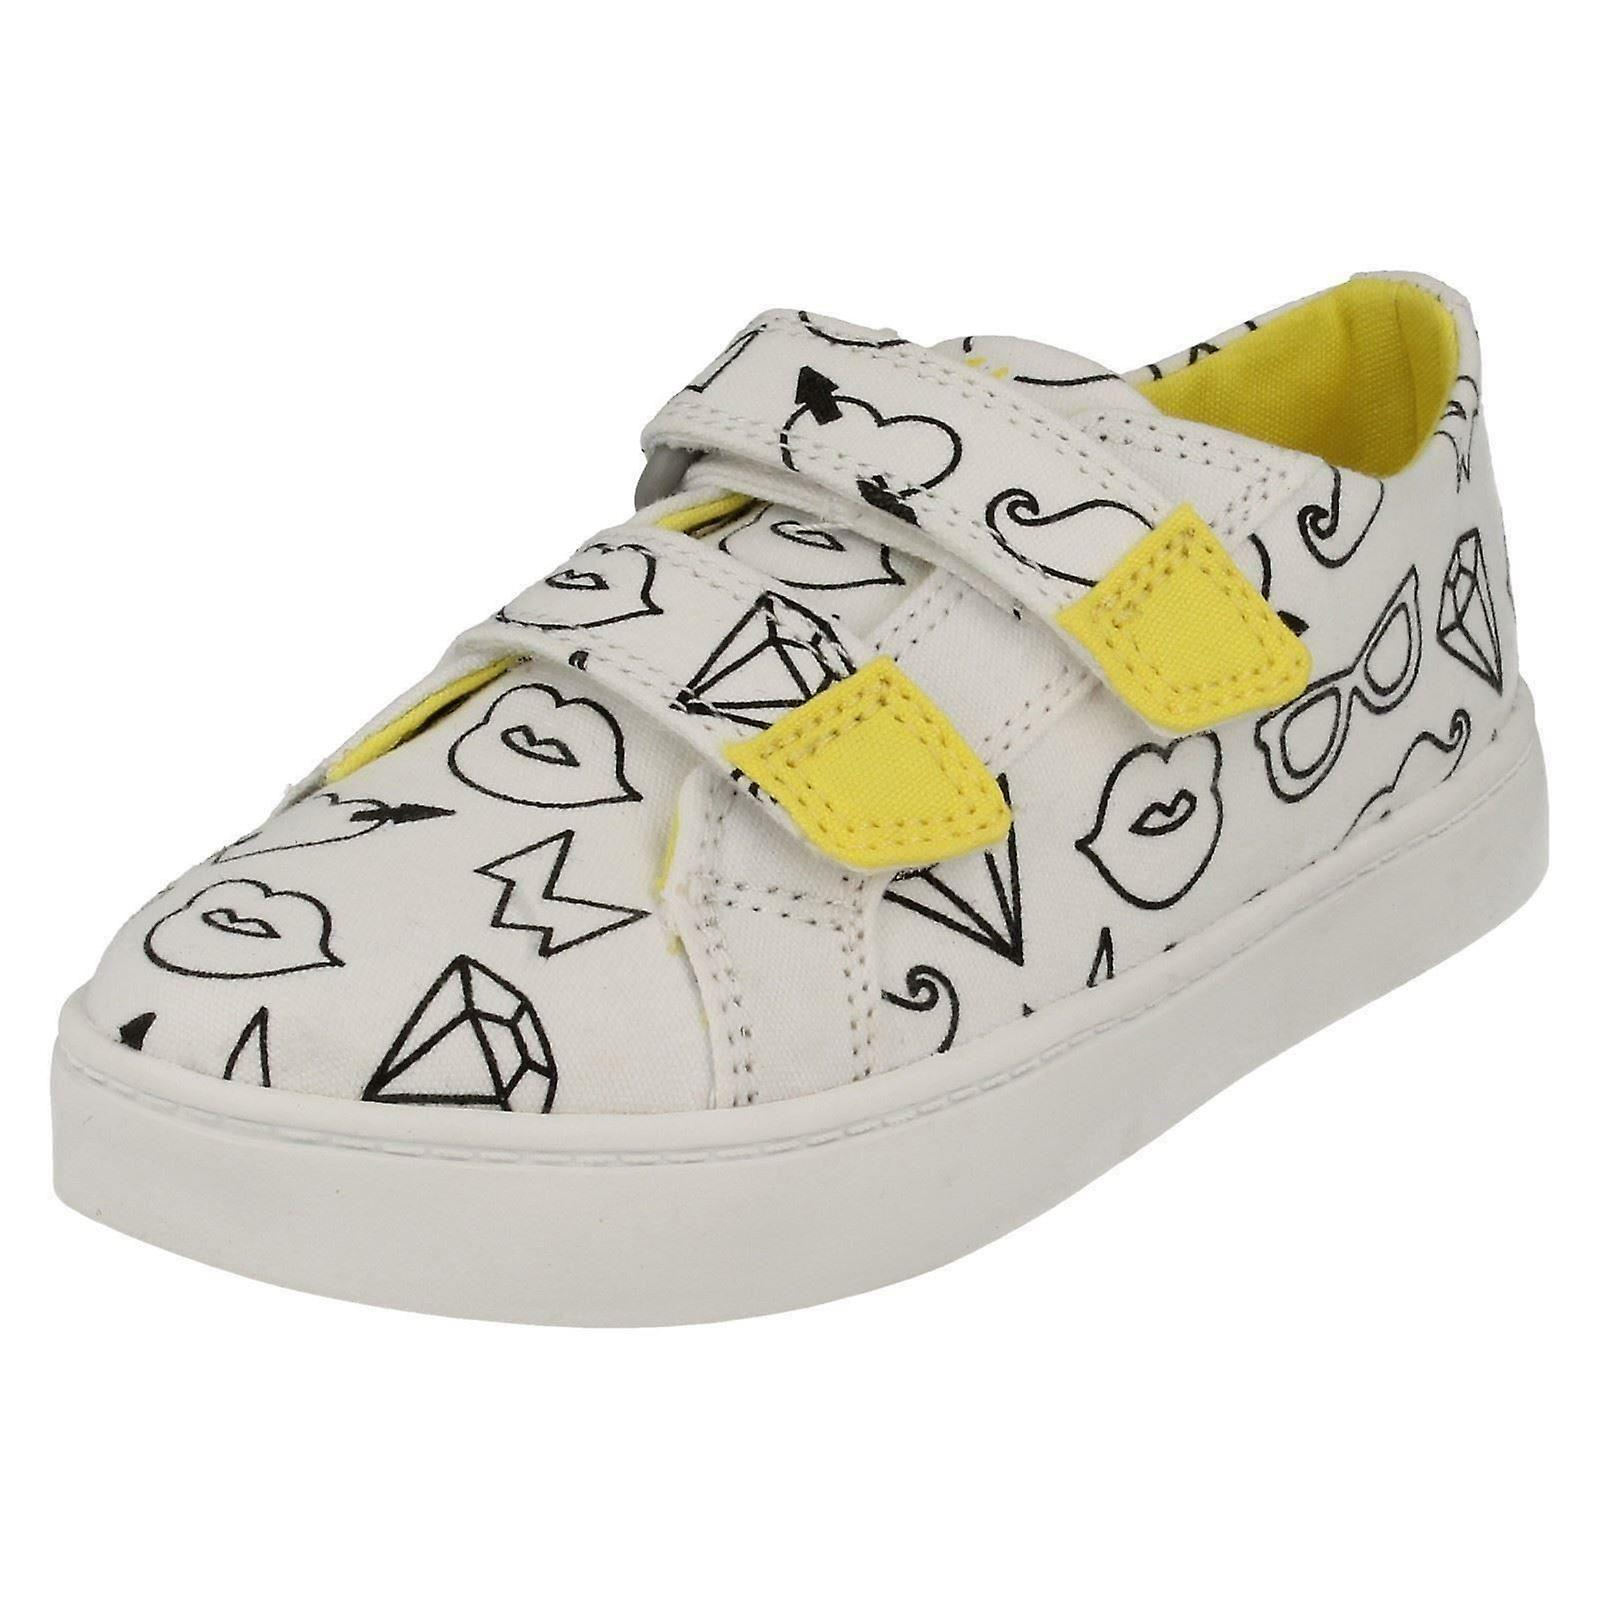 c162b56be6922e Mädchen-Clarks Leinwand Schuhe Pattie Sue - 26f1ee - schlemme-zahntechnik.de